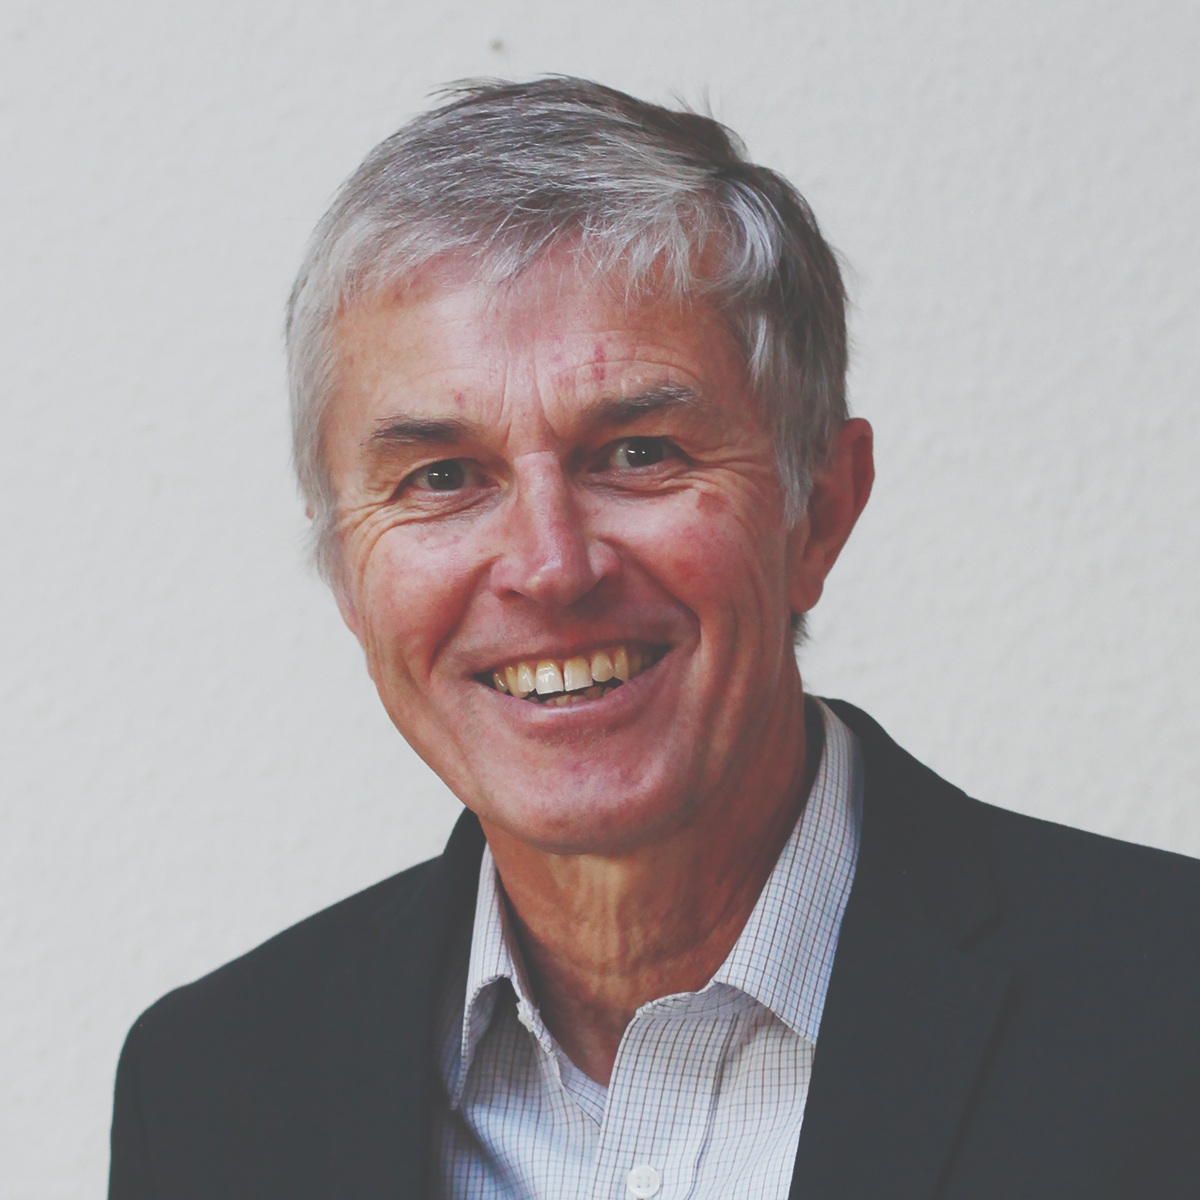 Dr Houghton - Author, GP